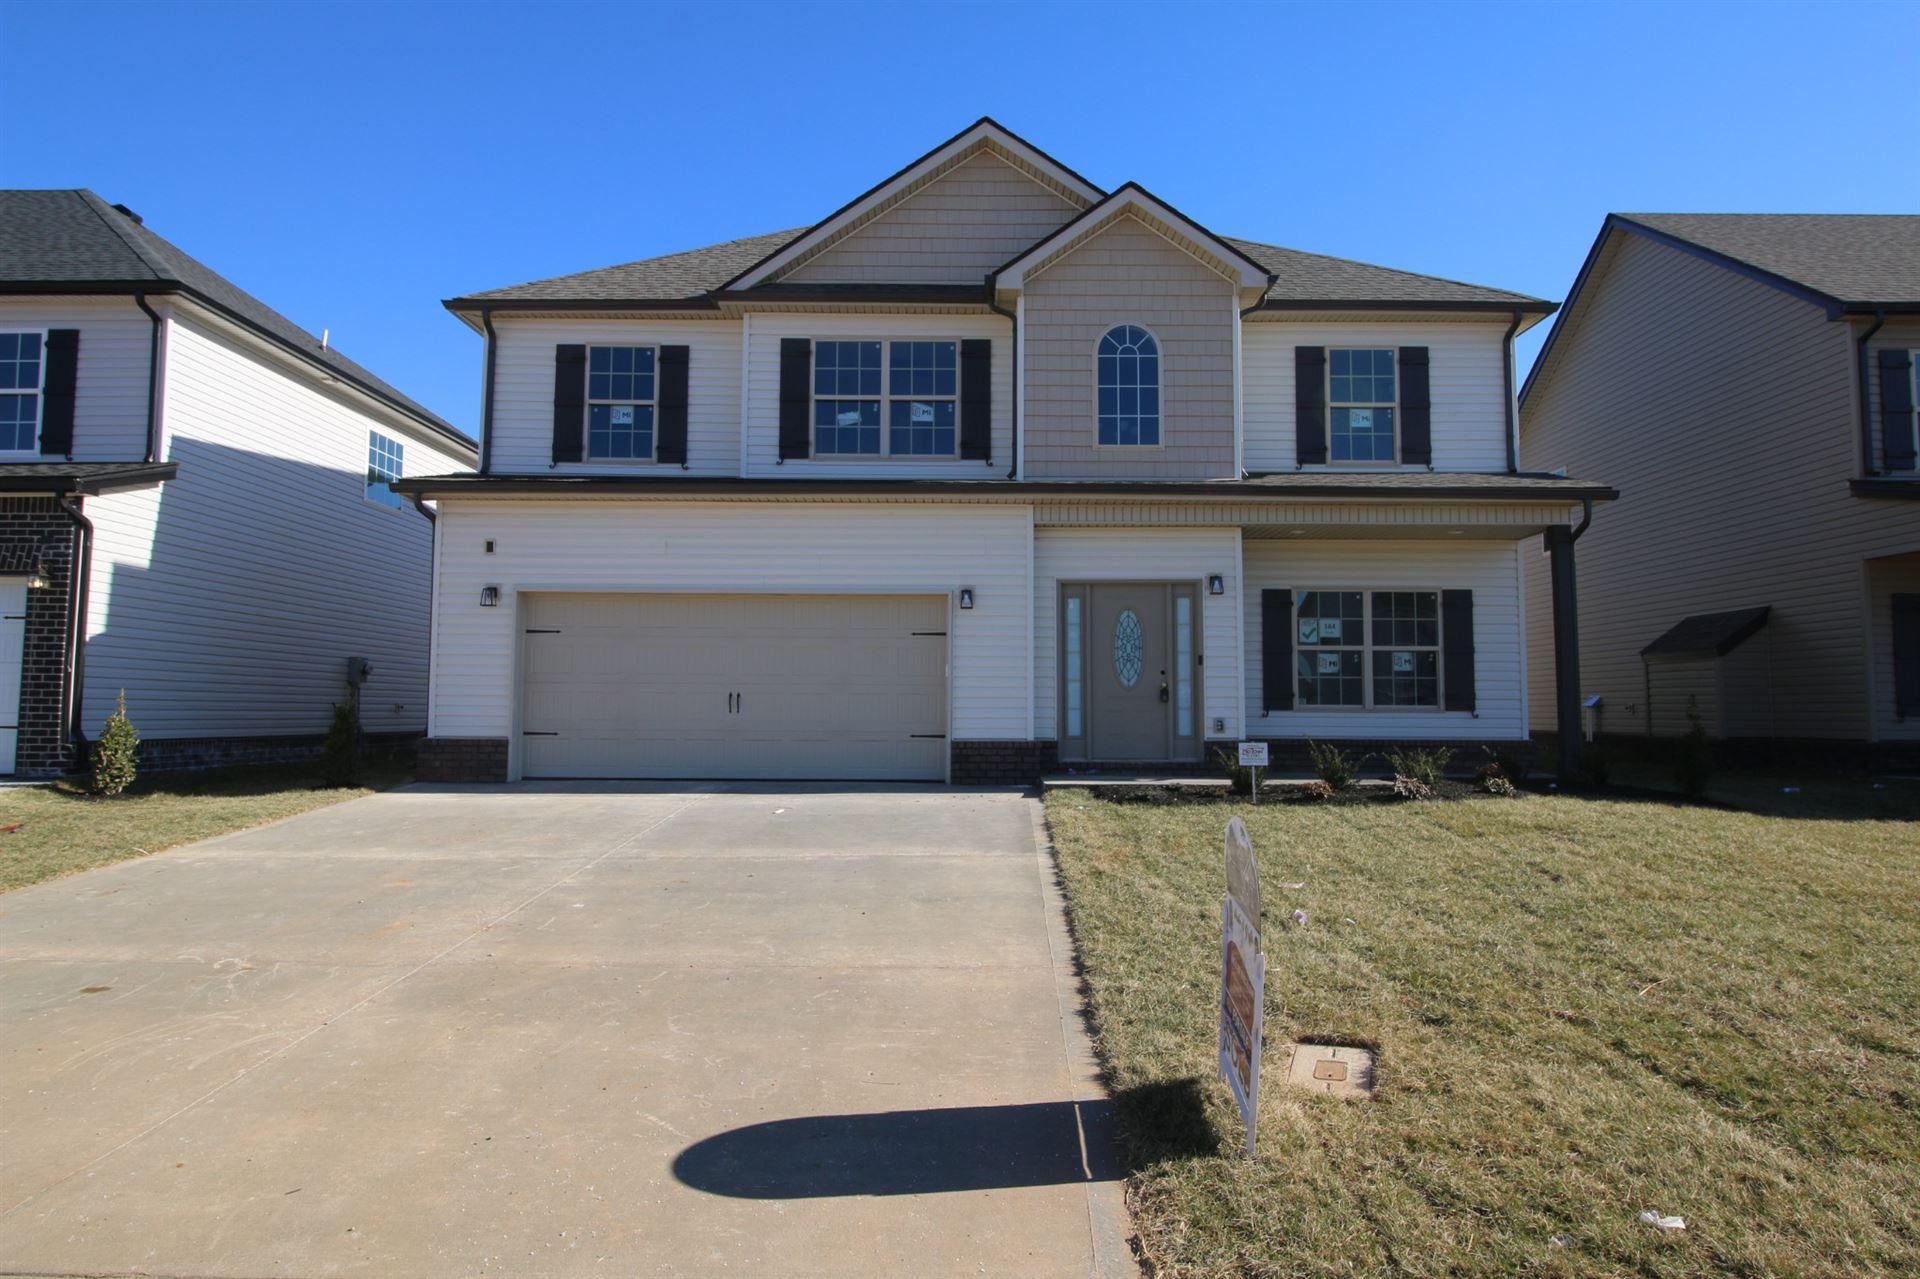 164 Mills Creek, Clarksville, TN 37042 - MLS#: 2294033